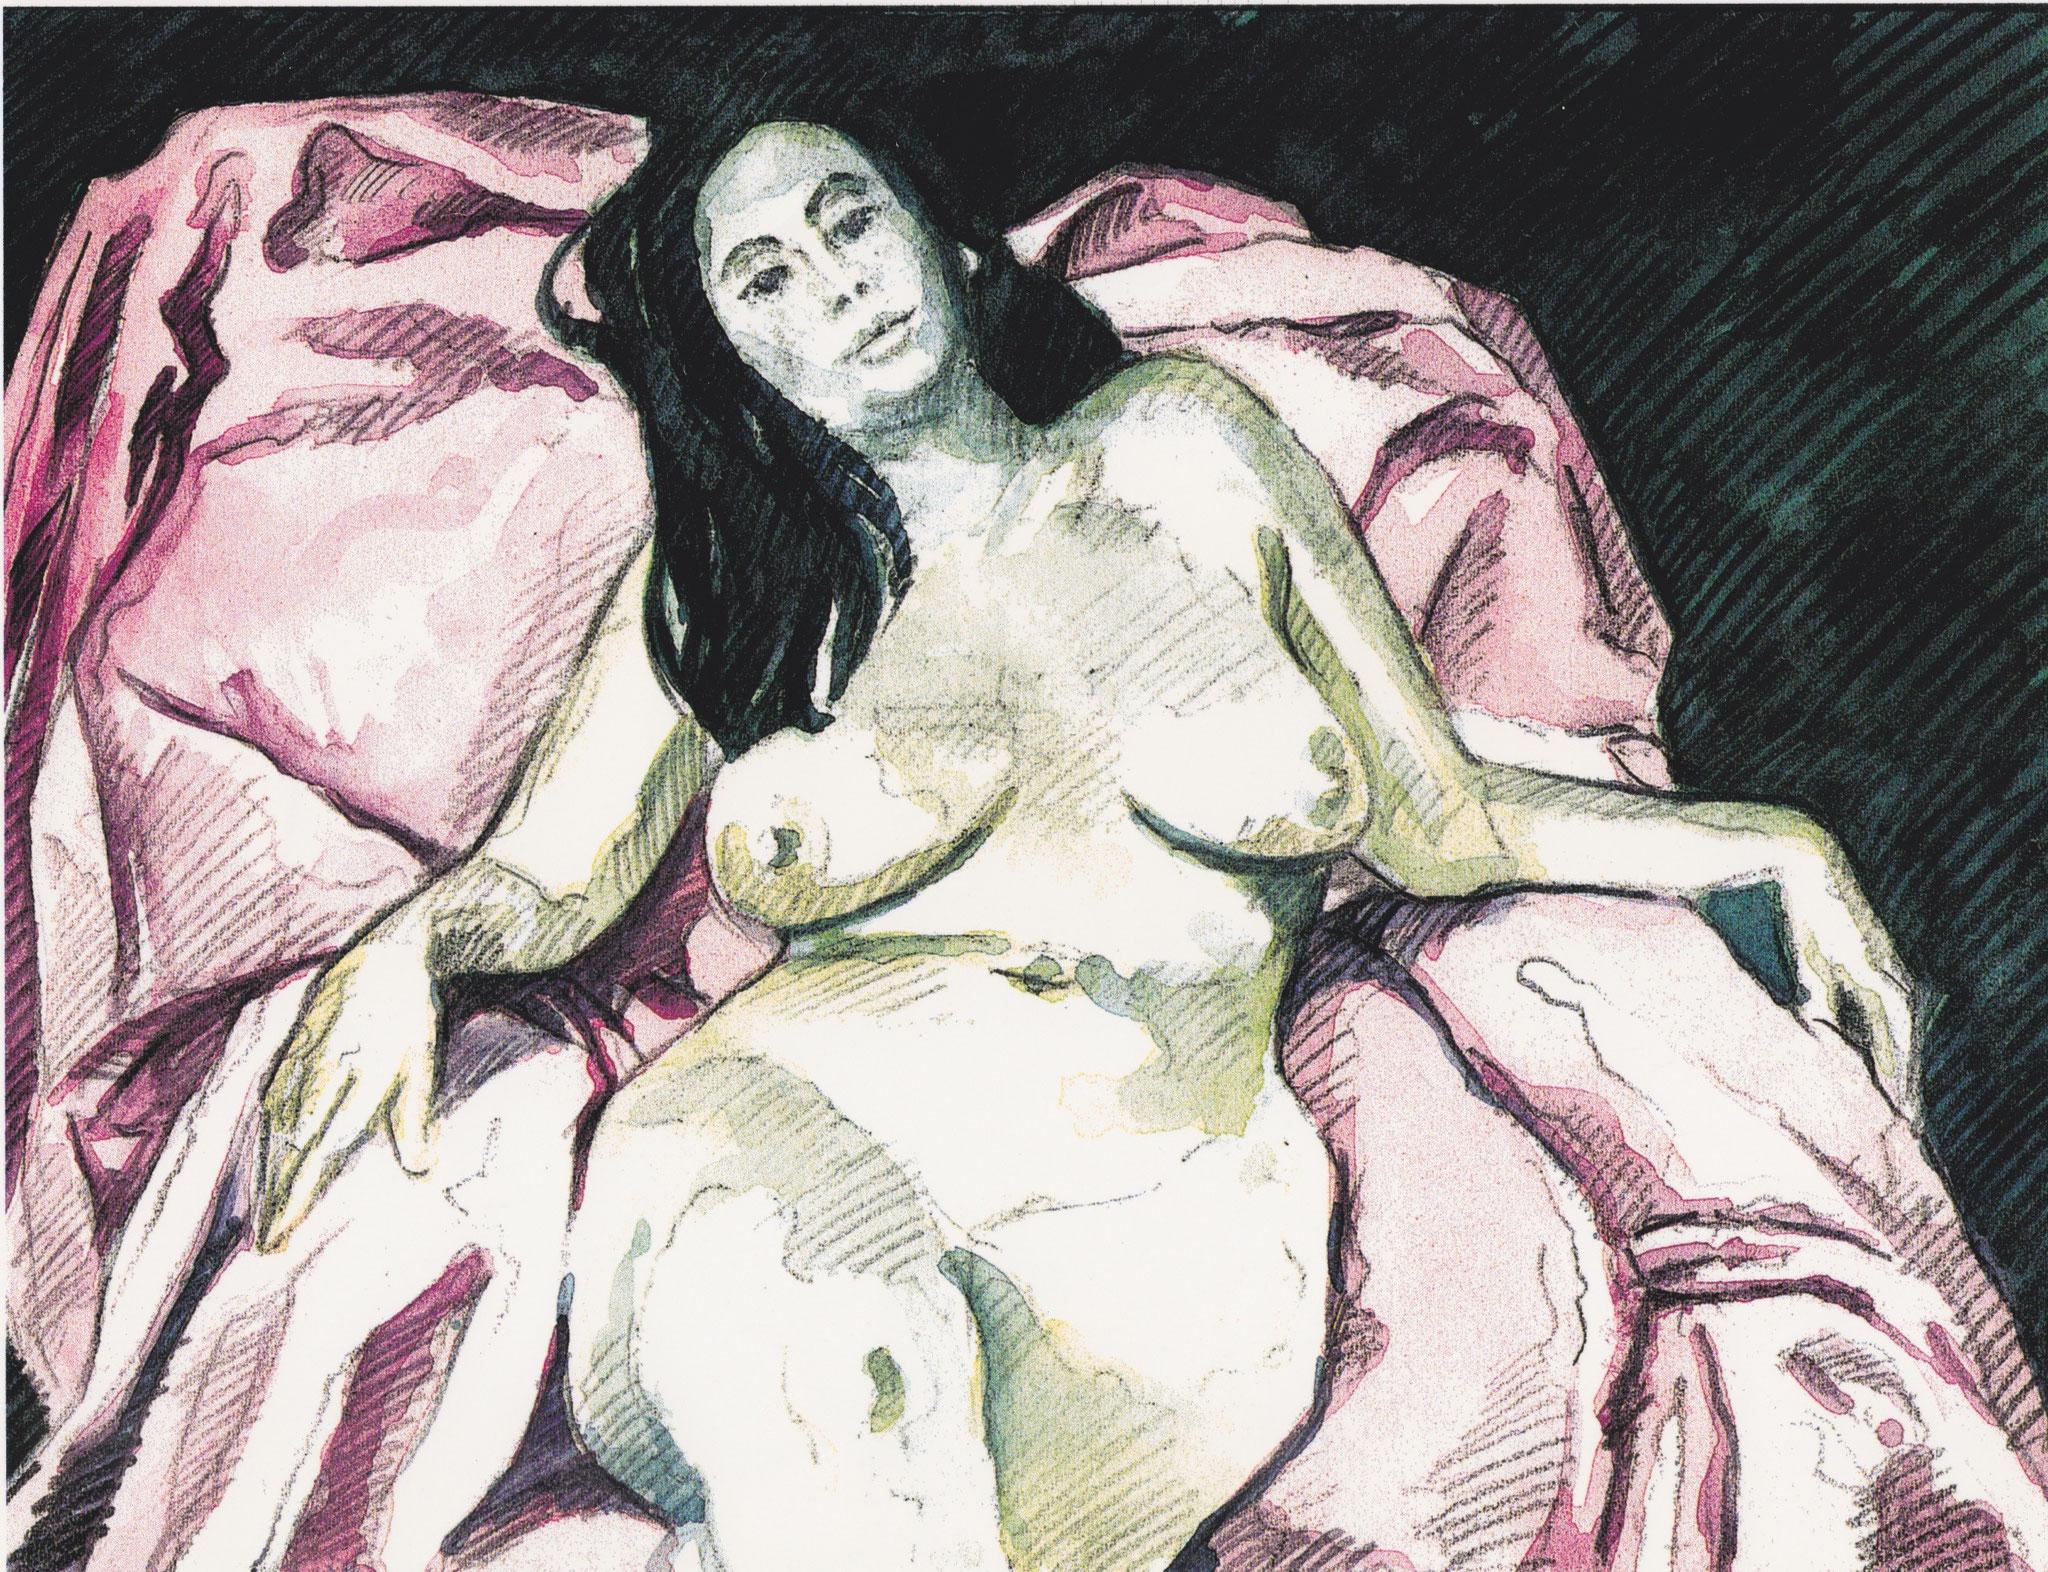 Aktstudie, mixed media Aquarell/Pittstift, 20 x 30 cm, 2006